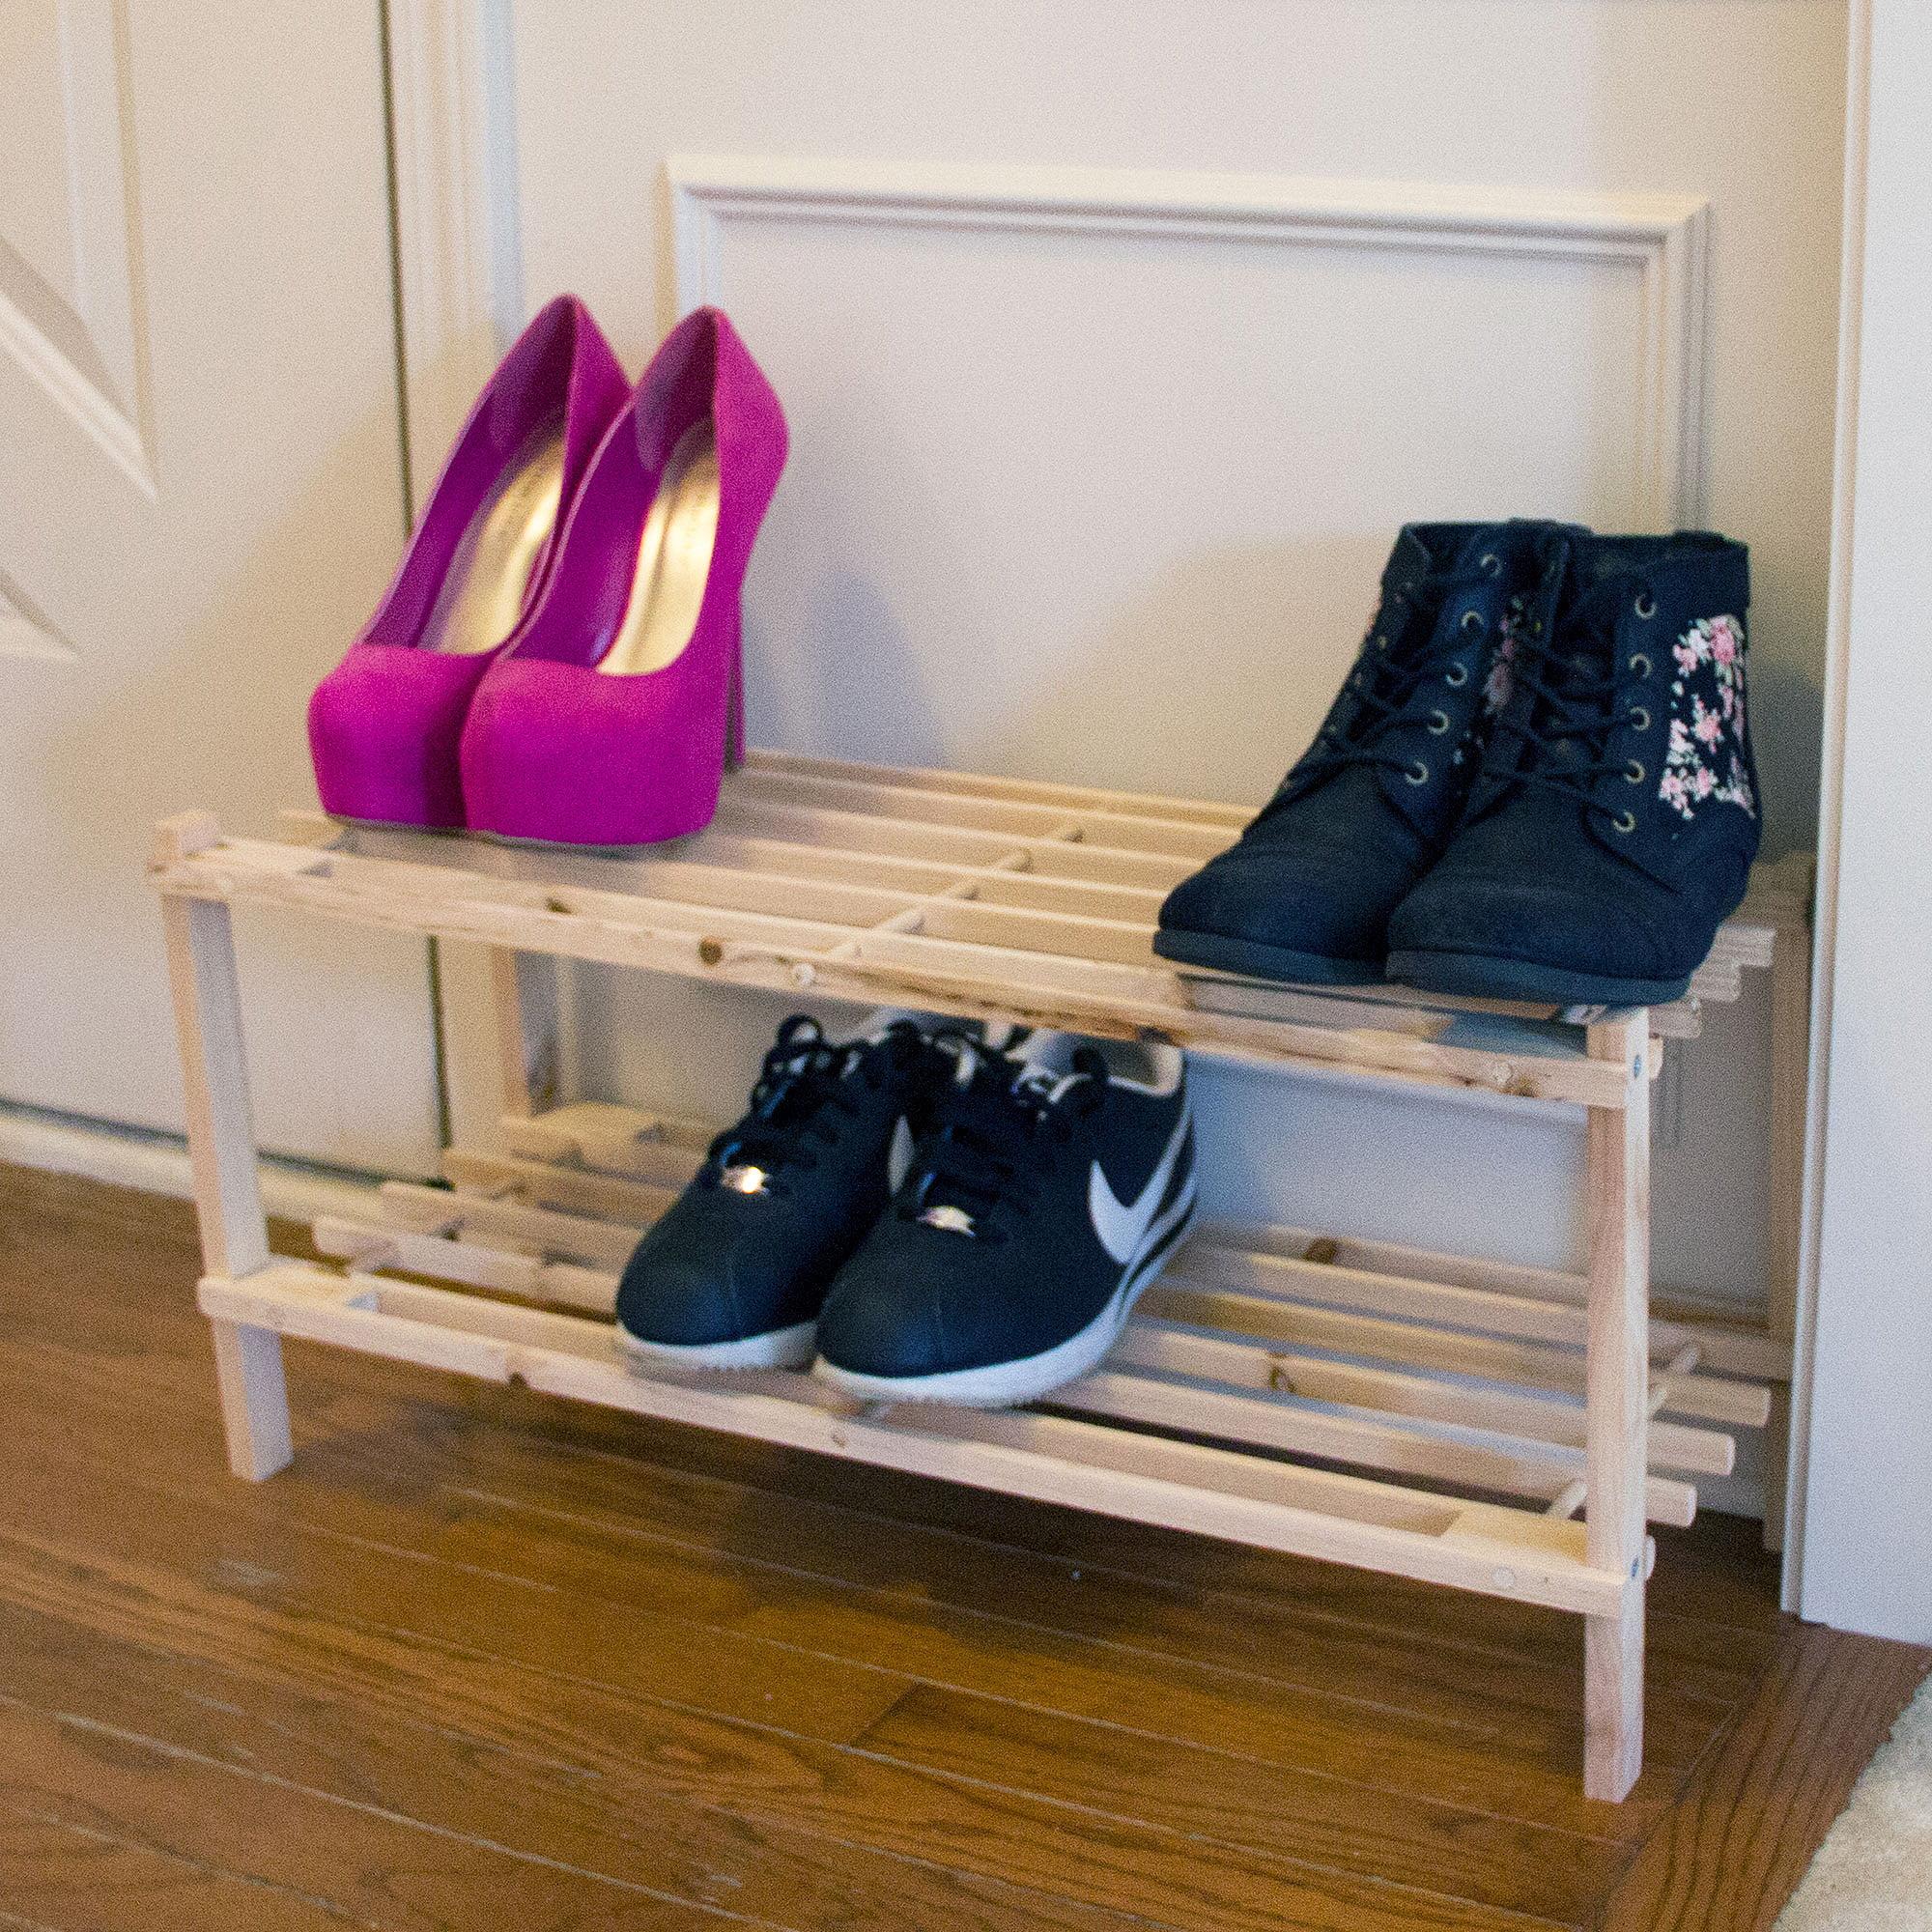 Lavish Home 2-Tier Blonde Wood Shoe Storage Rack